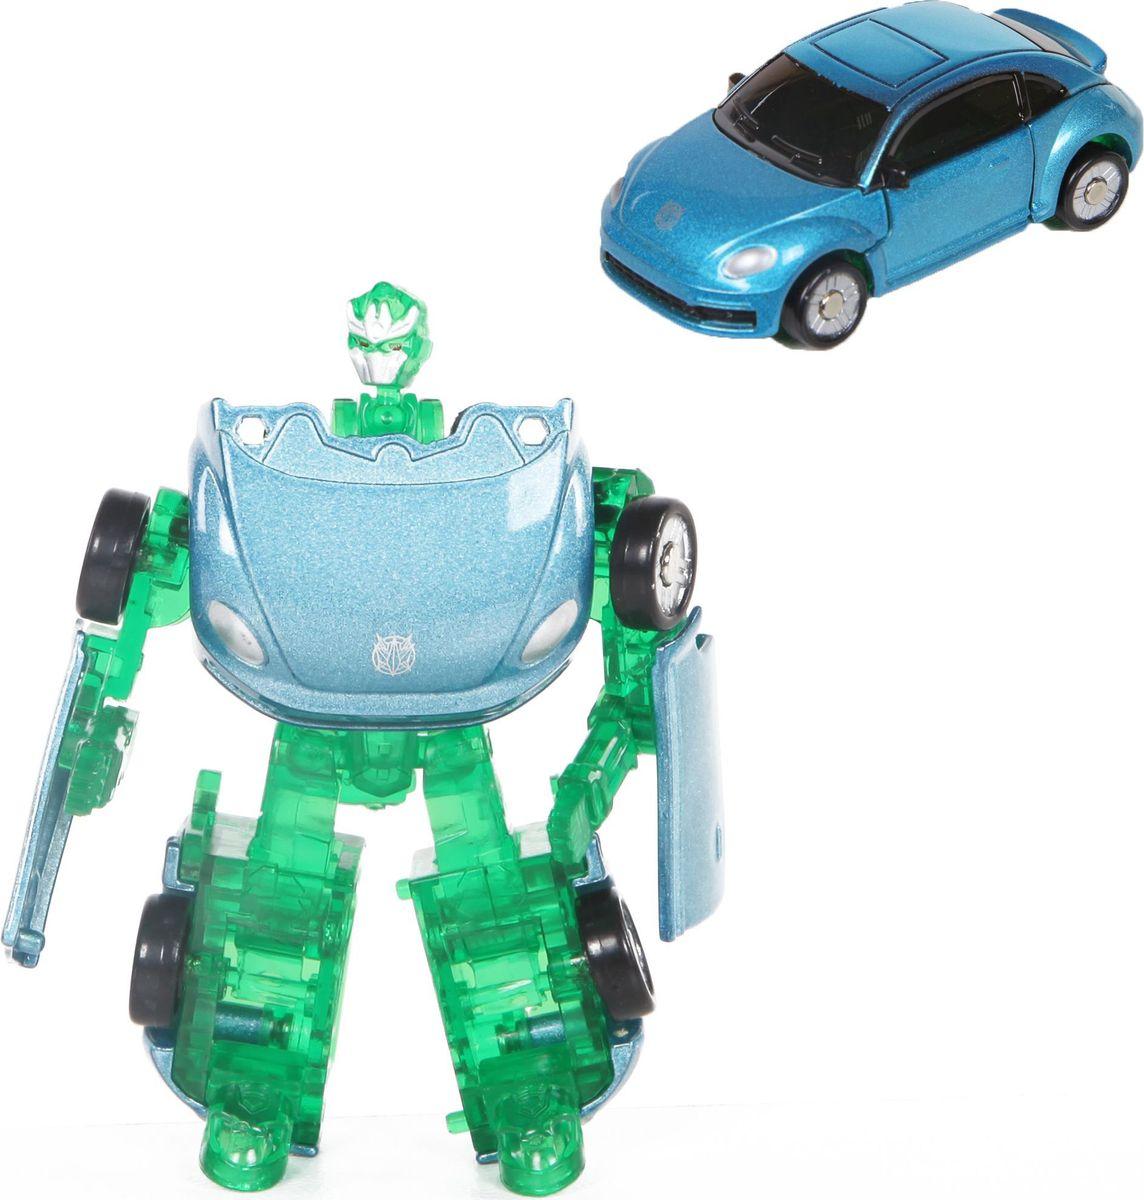 Yako Робот-трансформер цвет голубой зеленый Y3686144-1 кукла yako m6579 6